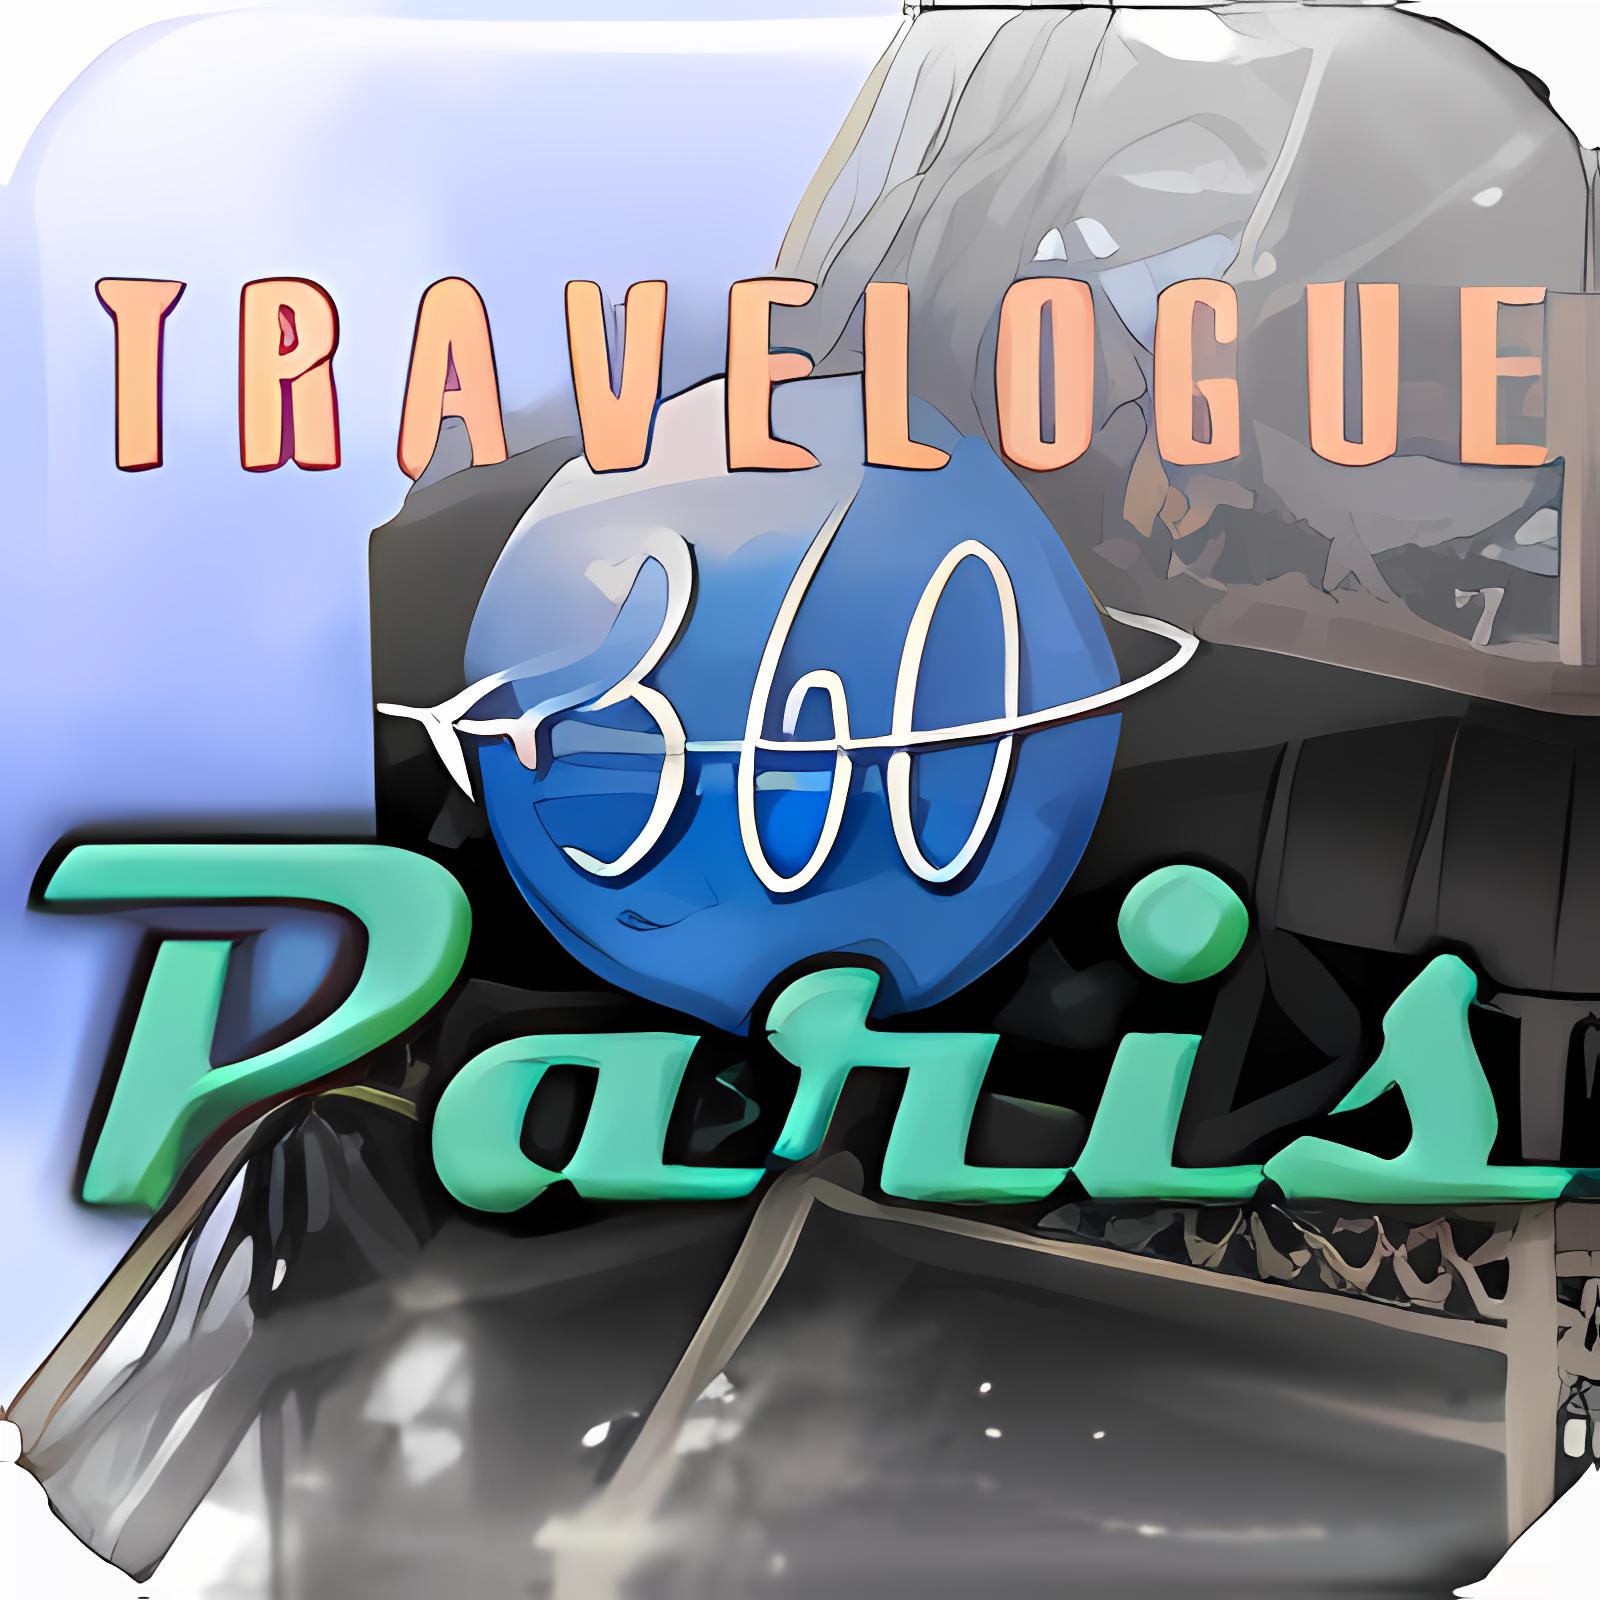 Travelogue 360: Paris